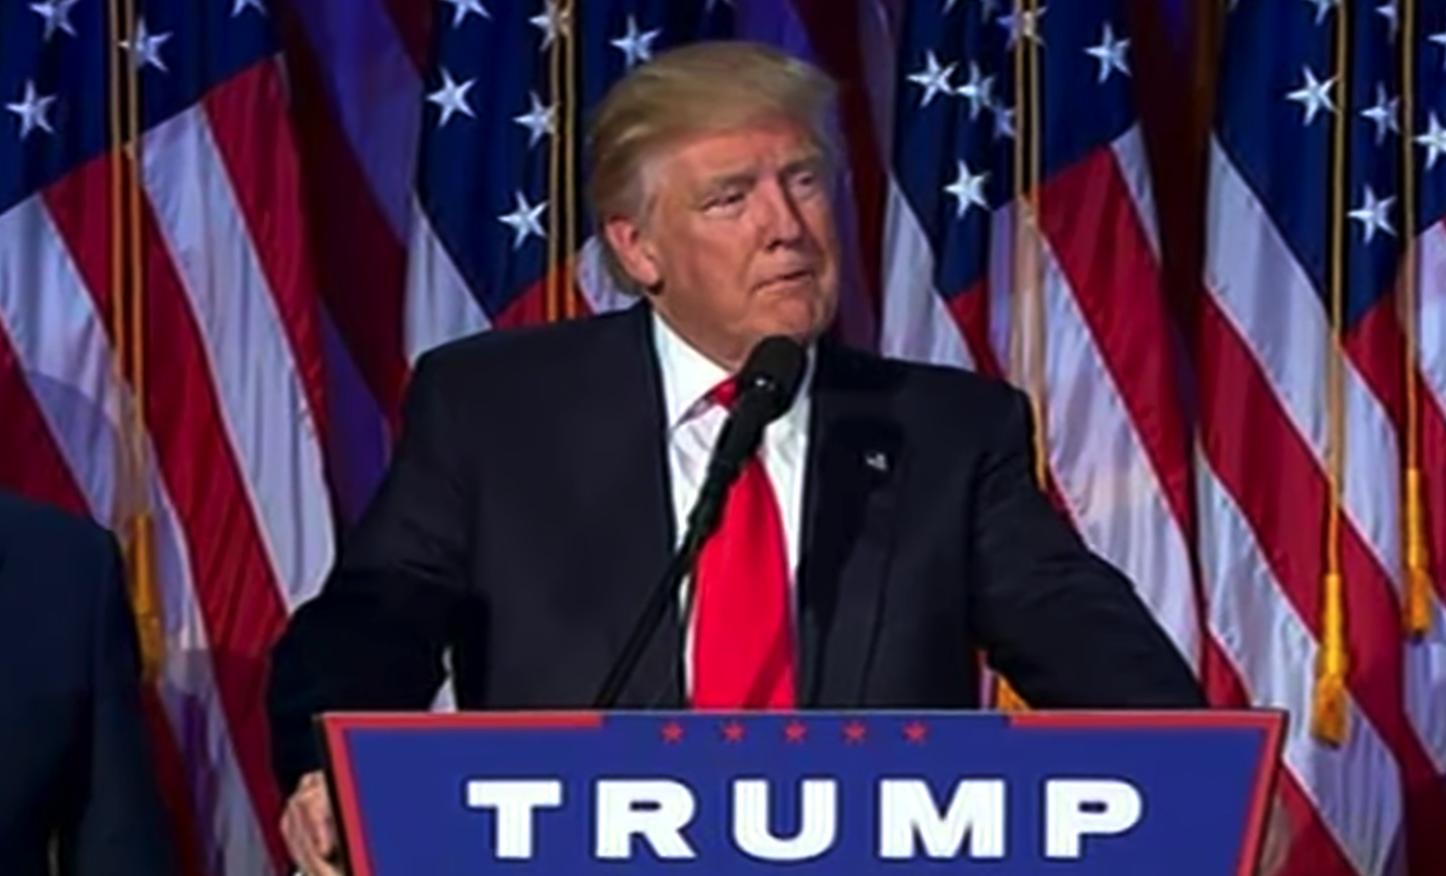 Donald Trump Victory Speech